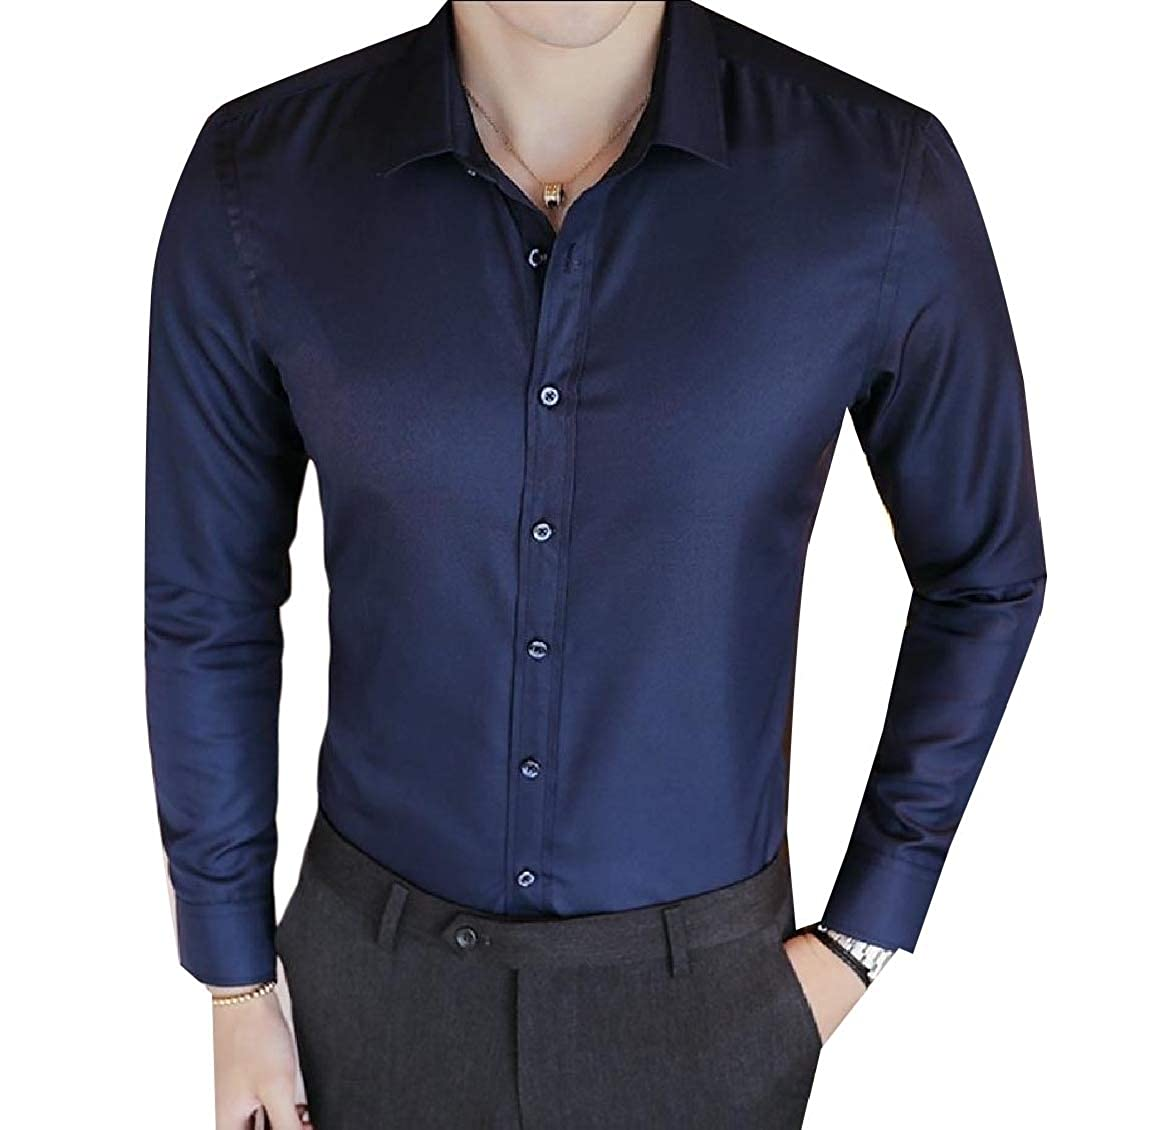 Vska Mens Formal Basic Classic Non-Iron Solid Long Sleeve Dress Shirts